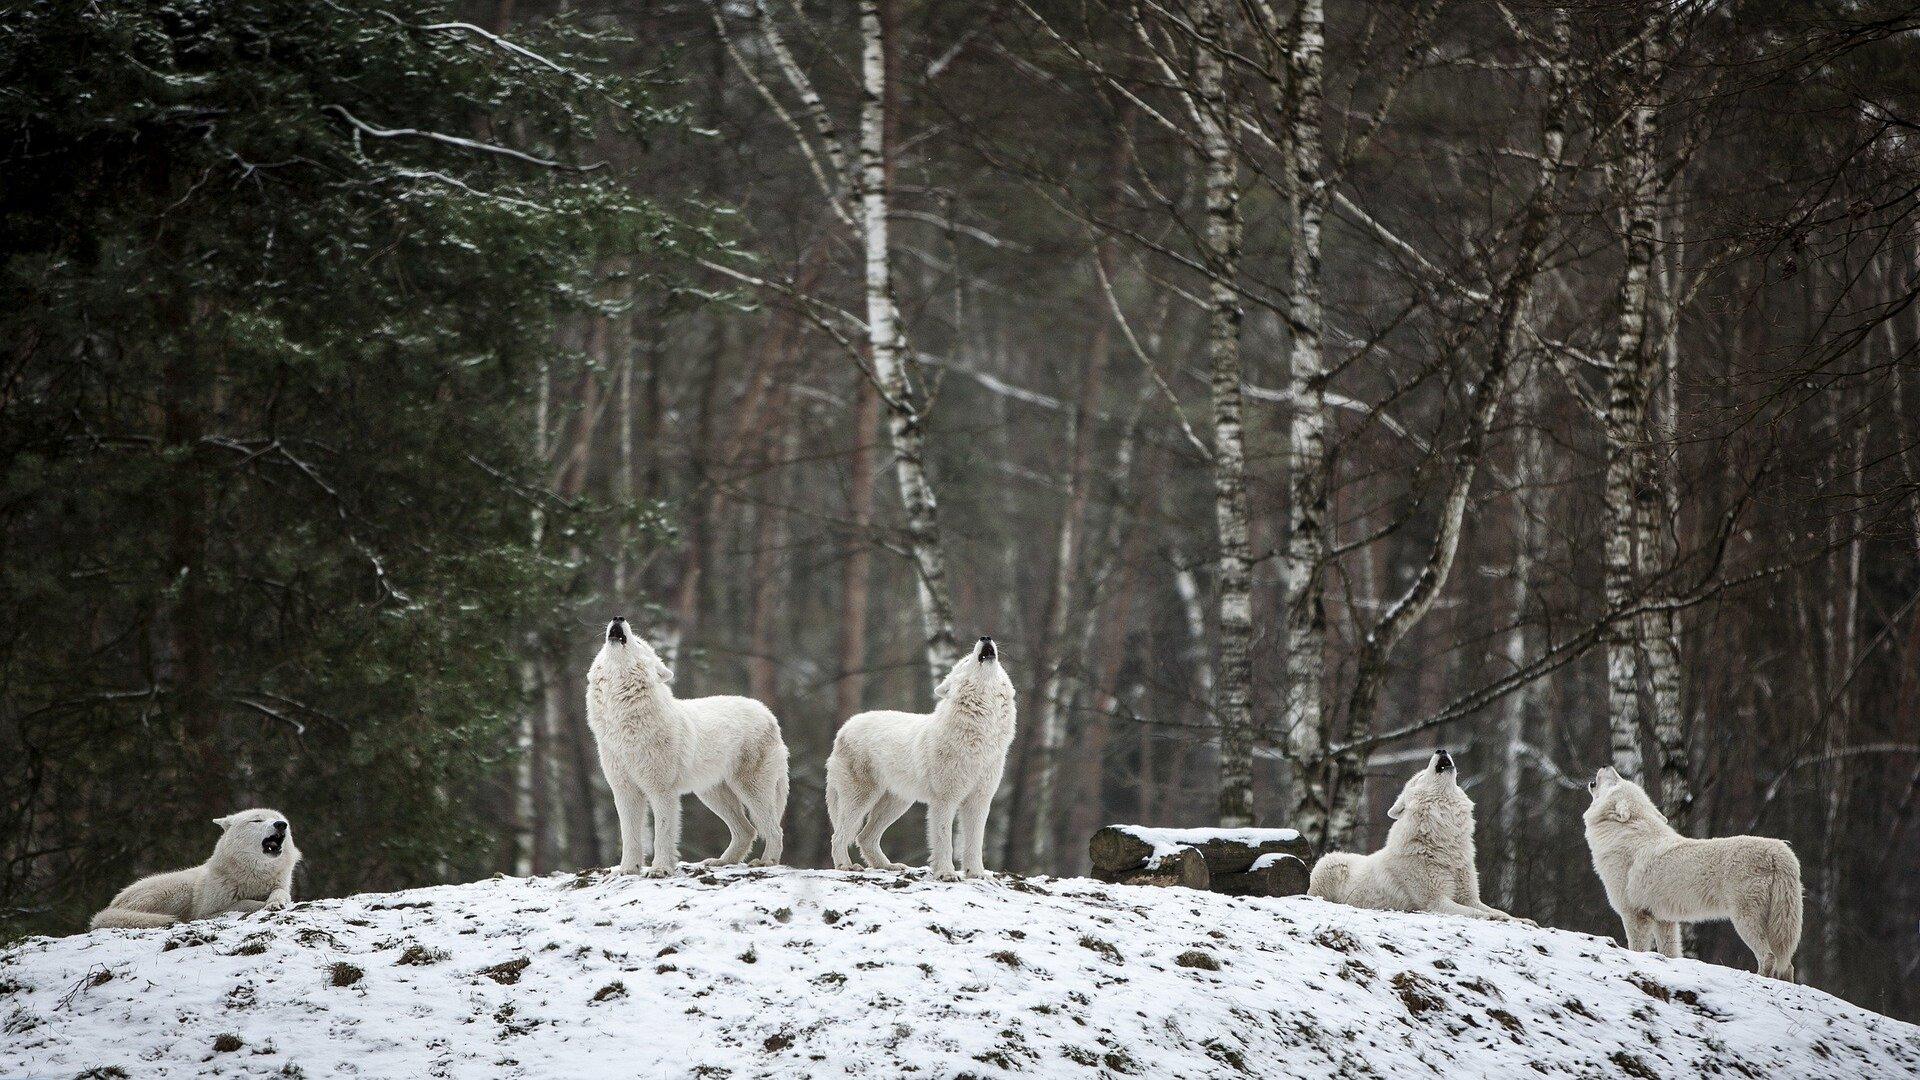 lupi artici